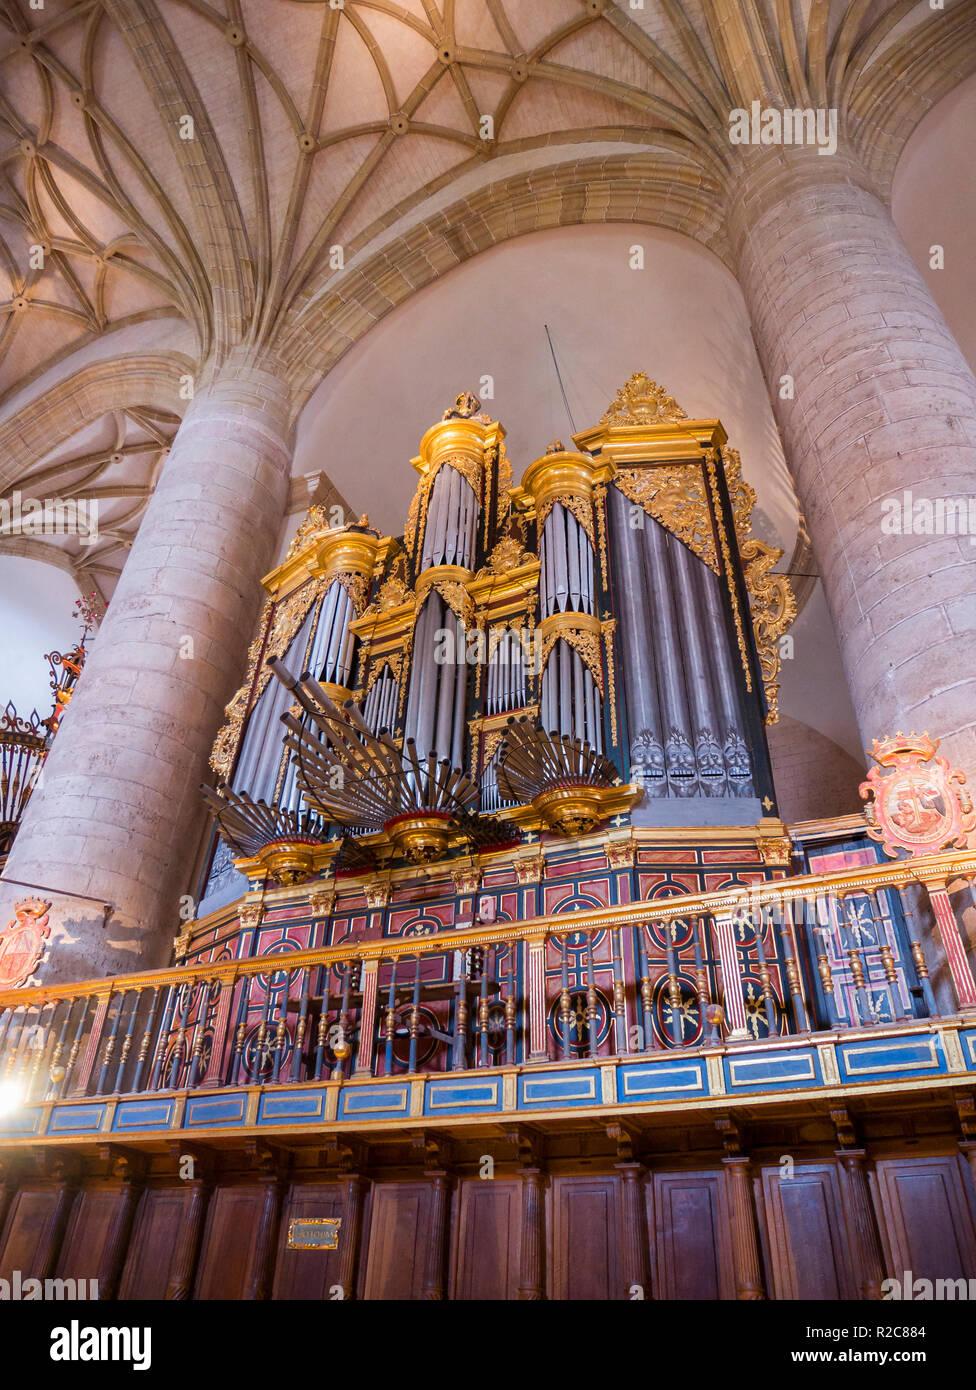 Órgano de la iglesia del Monasterio de San Millán de Yuso. San Millán de la Cogolla. La Rioja. España Imagen De Stock